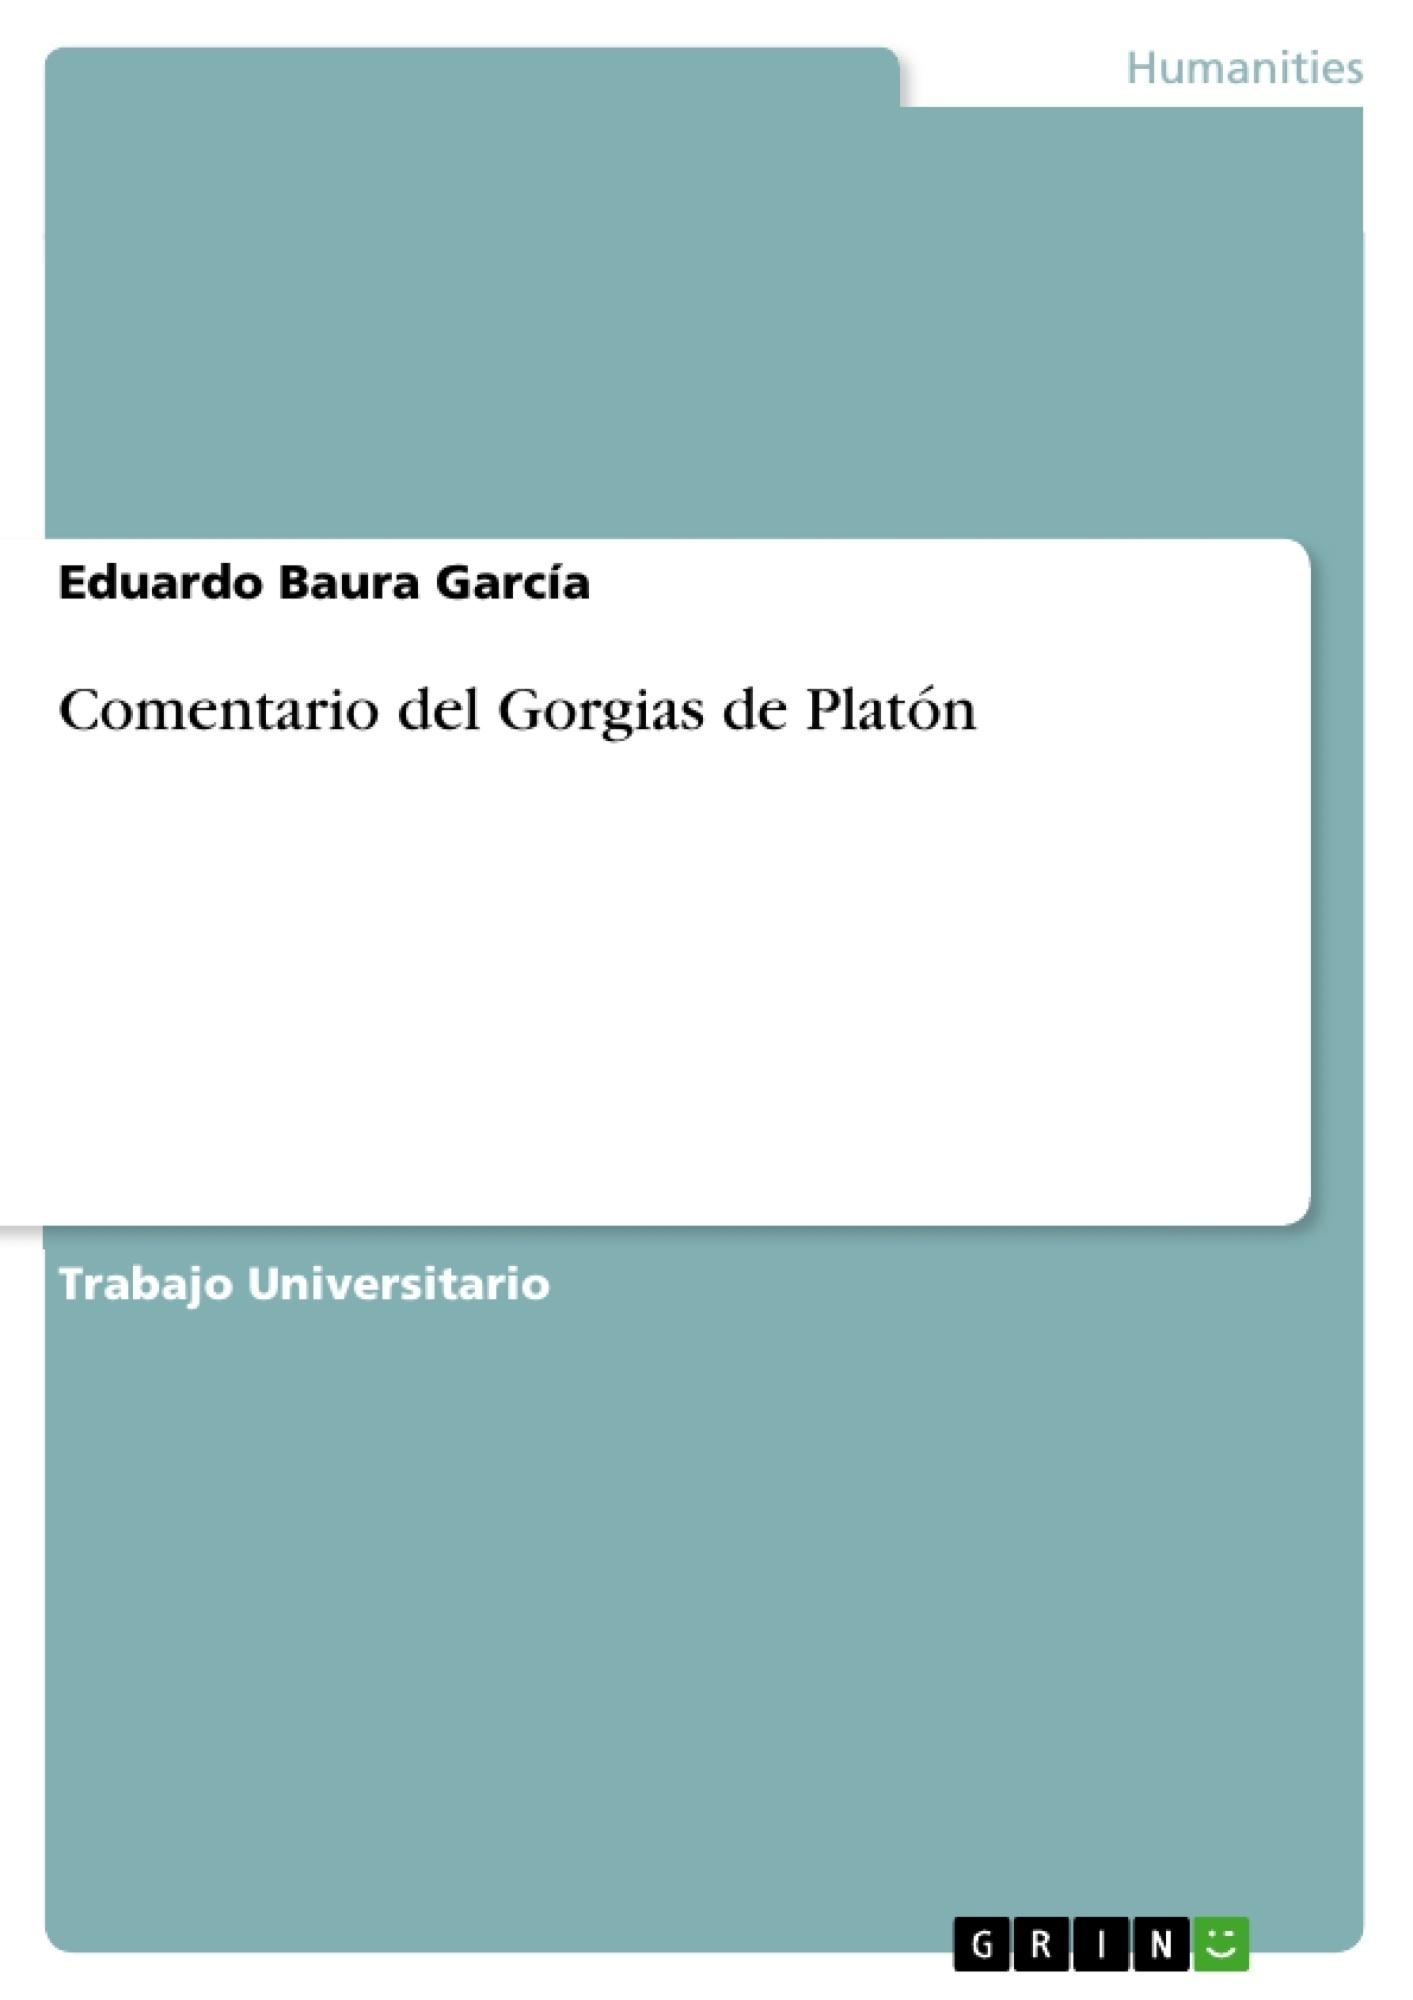 Título: Comentario del Gorgias de Platón